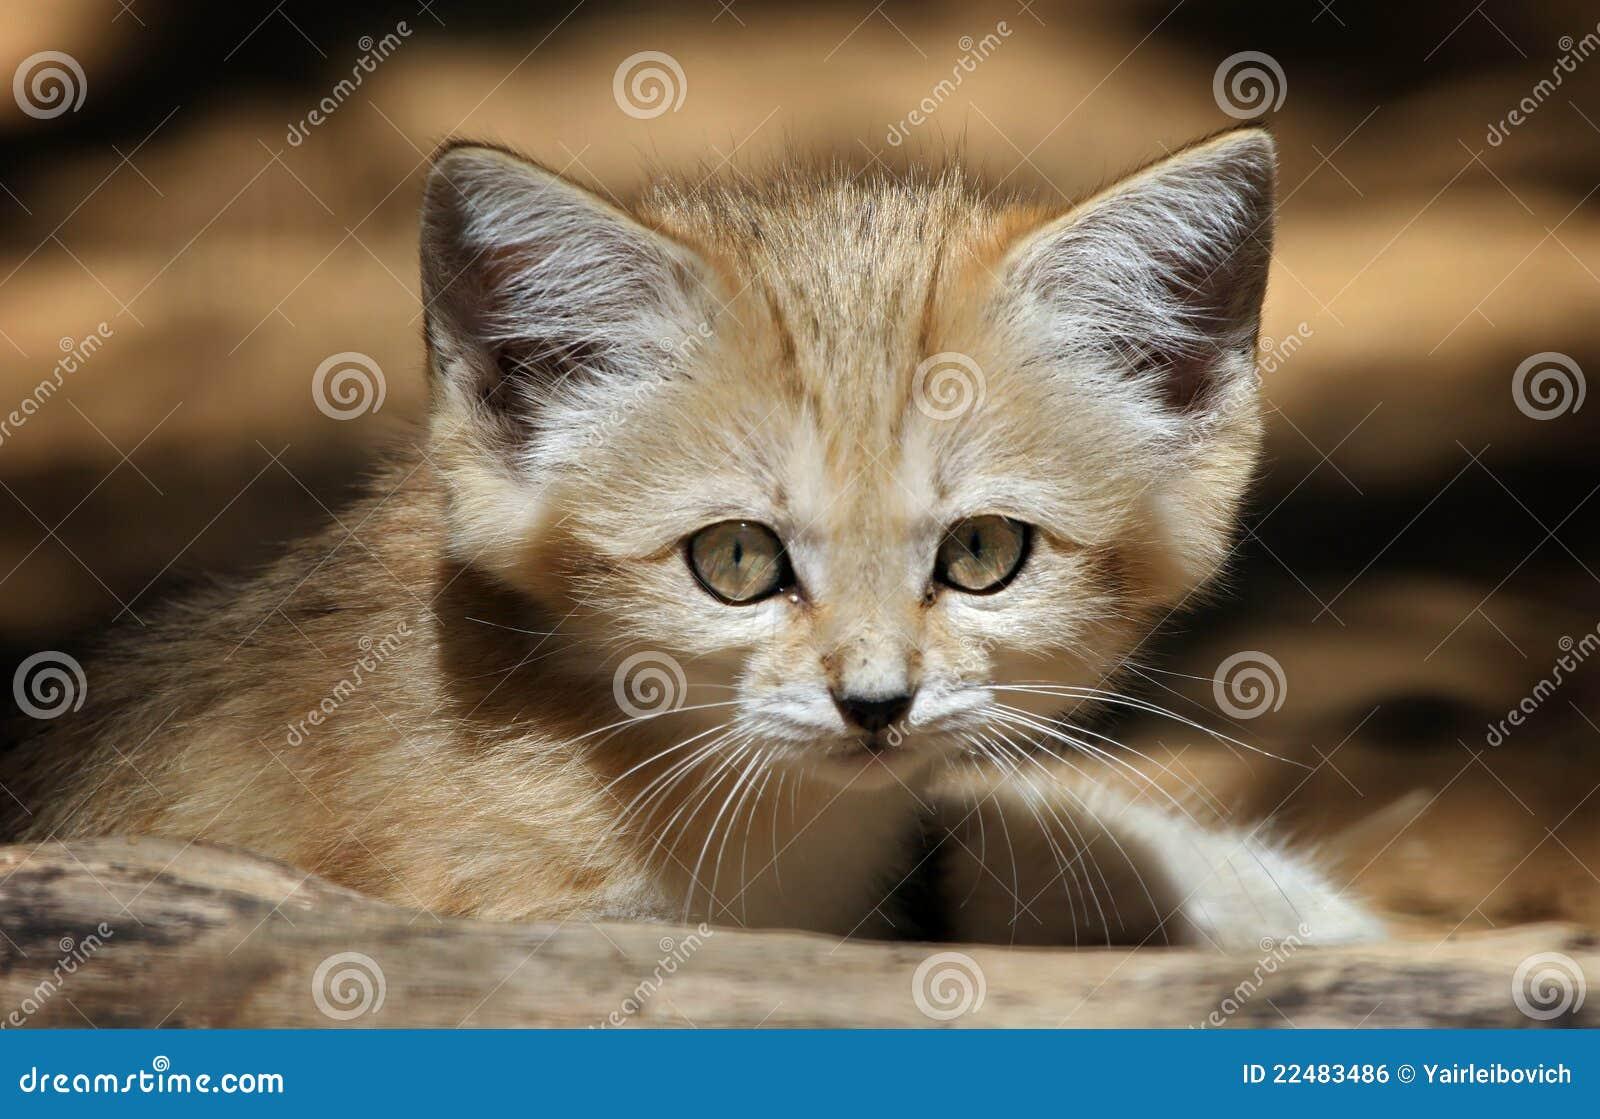 Gato de areia